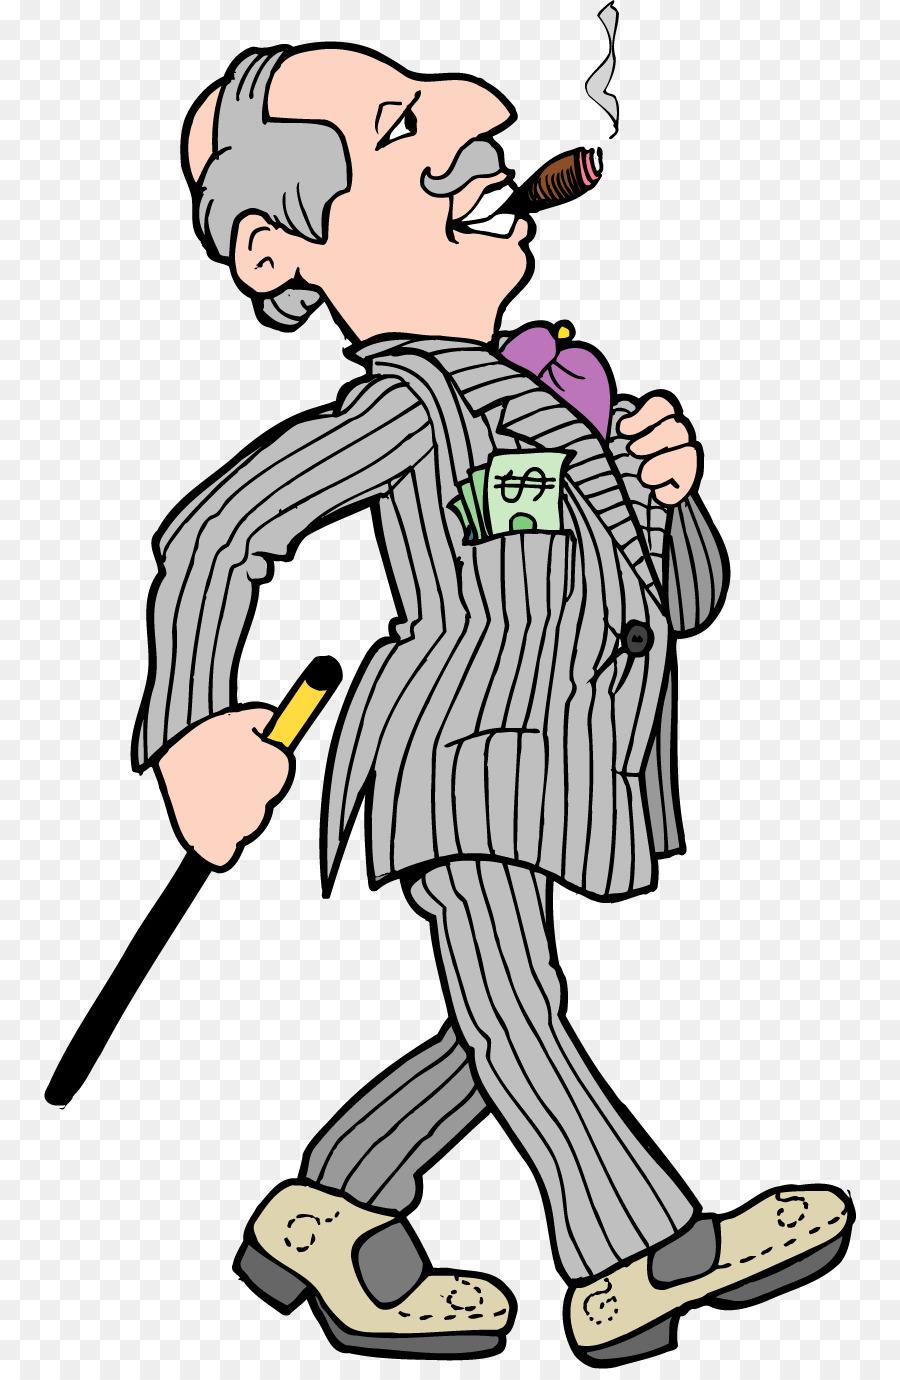 kisspng cartoon vector painted man smoking 5aa6dc416962e2.5426965115208848014317